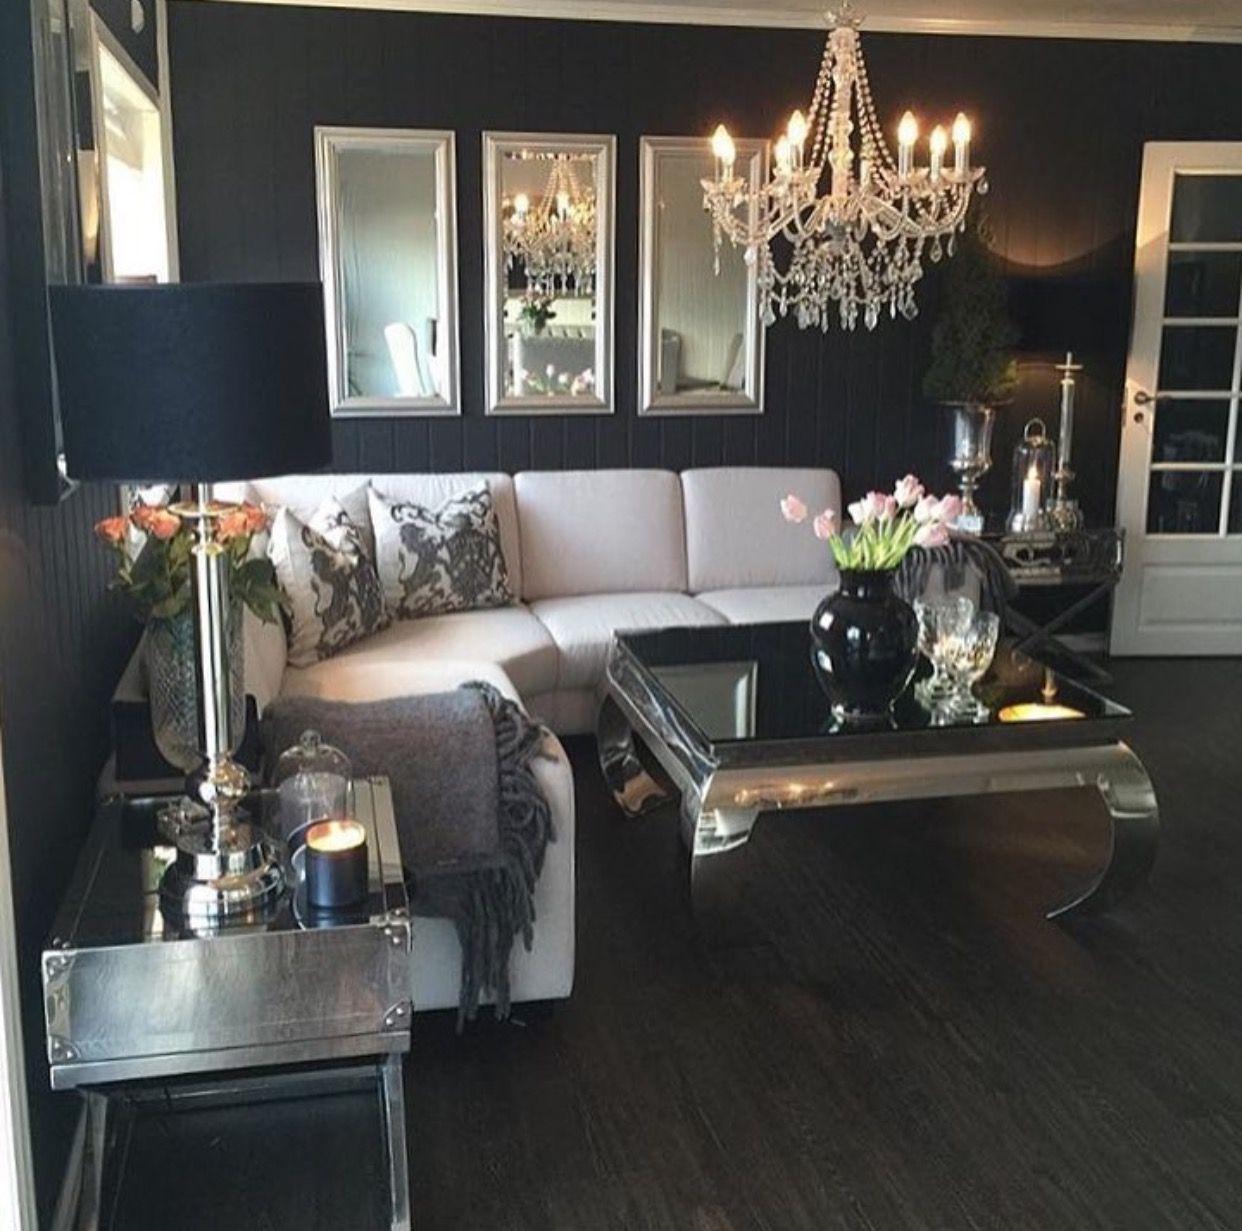 Modern Glam Living Room Decorating Ideas 19: Black Walls In A Modern Glam Living Room